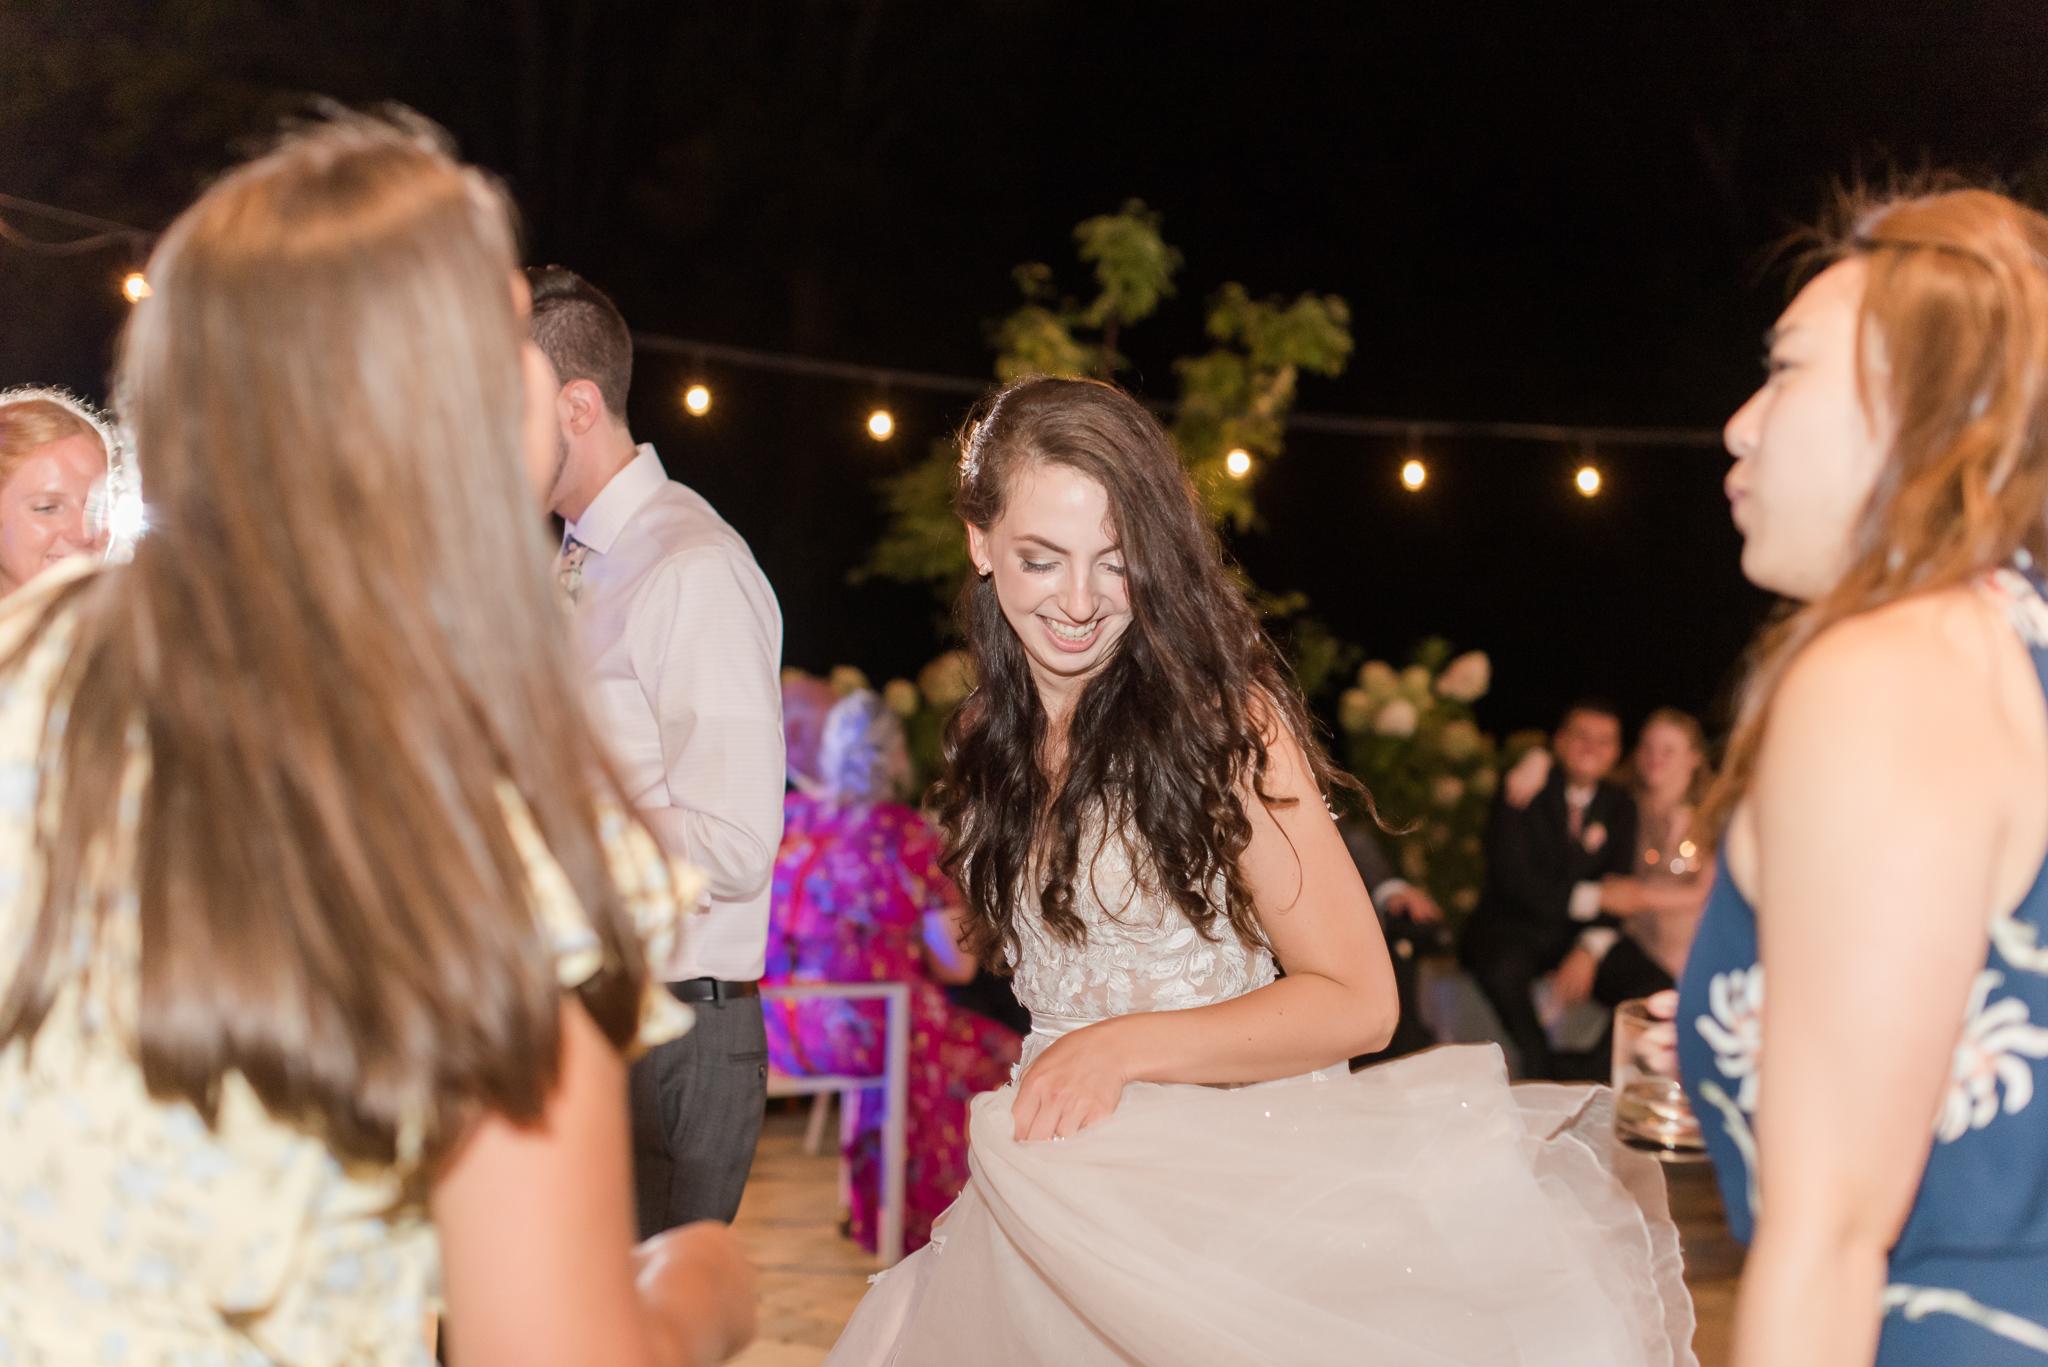 Sycamore at Mallow Run Wedding7100.jpg